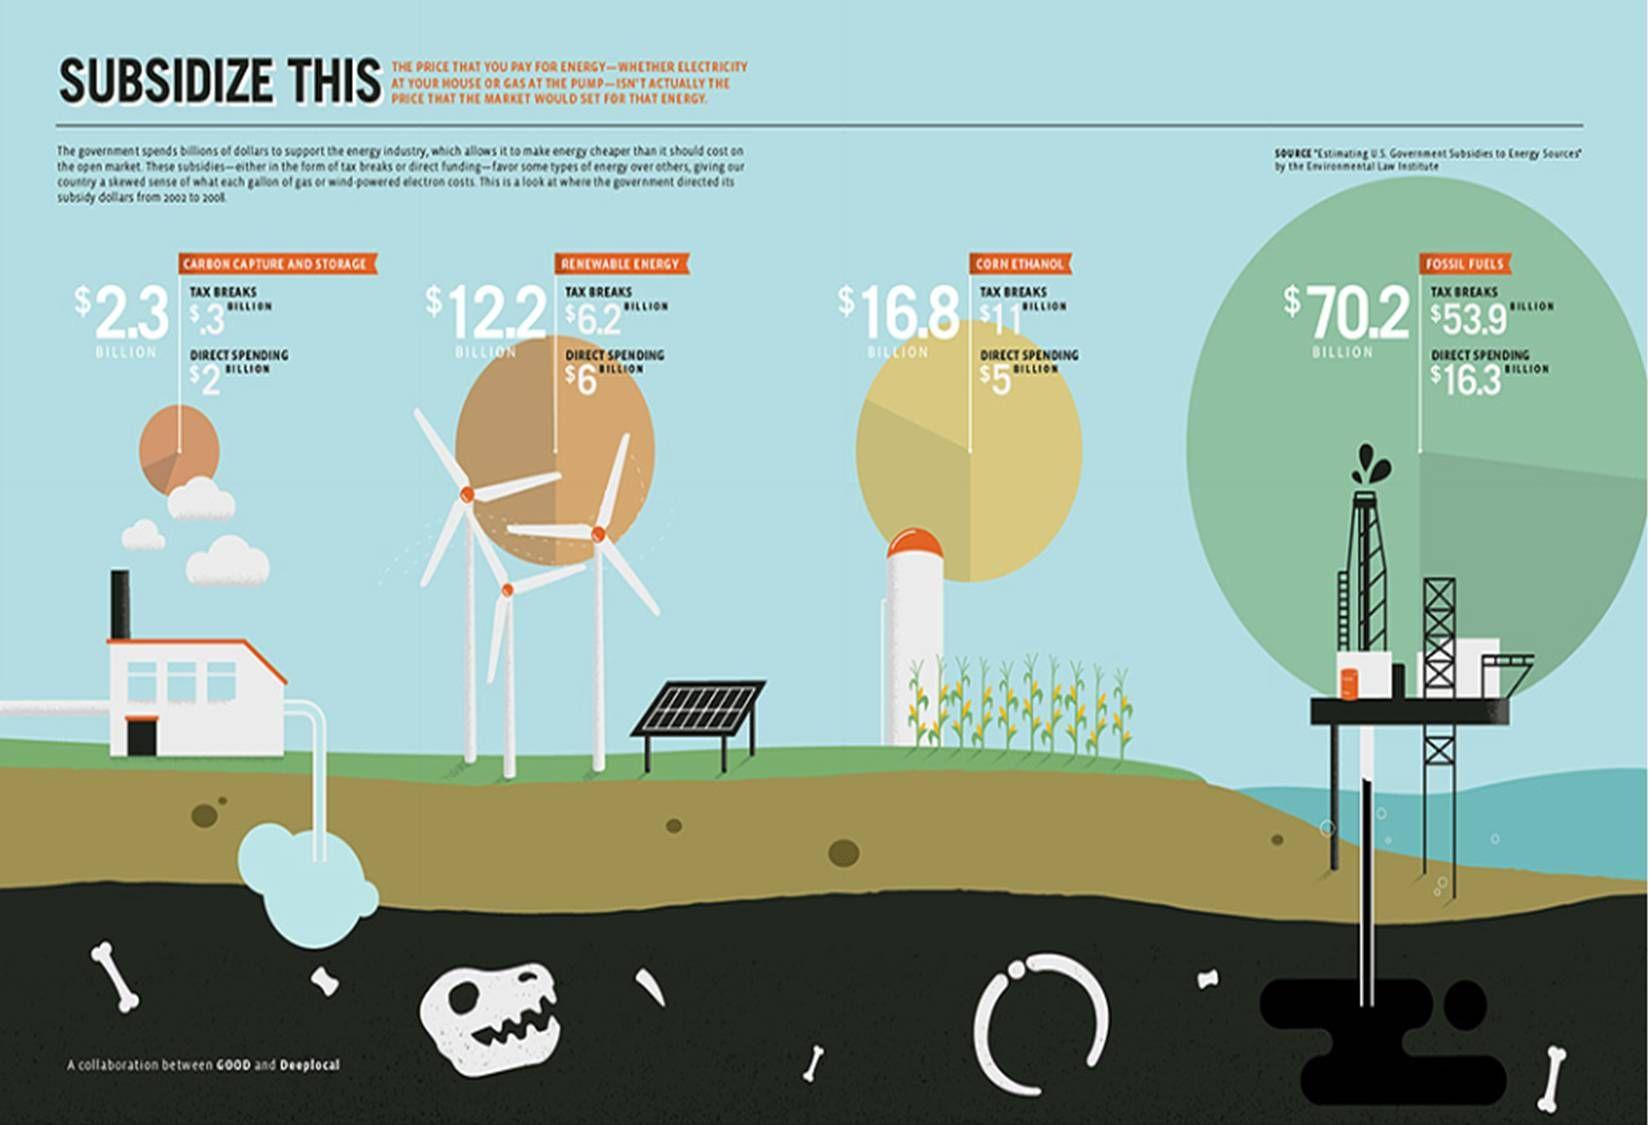 Energy Subsidies Jpg Google Images Infographic Renewable Sources Of Energy Renewable Energy